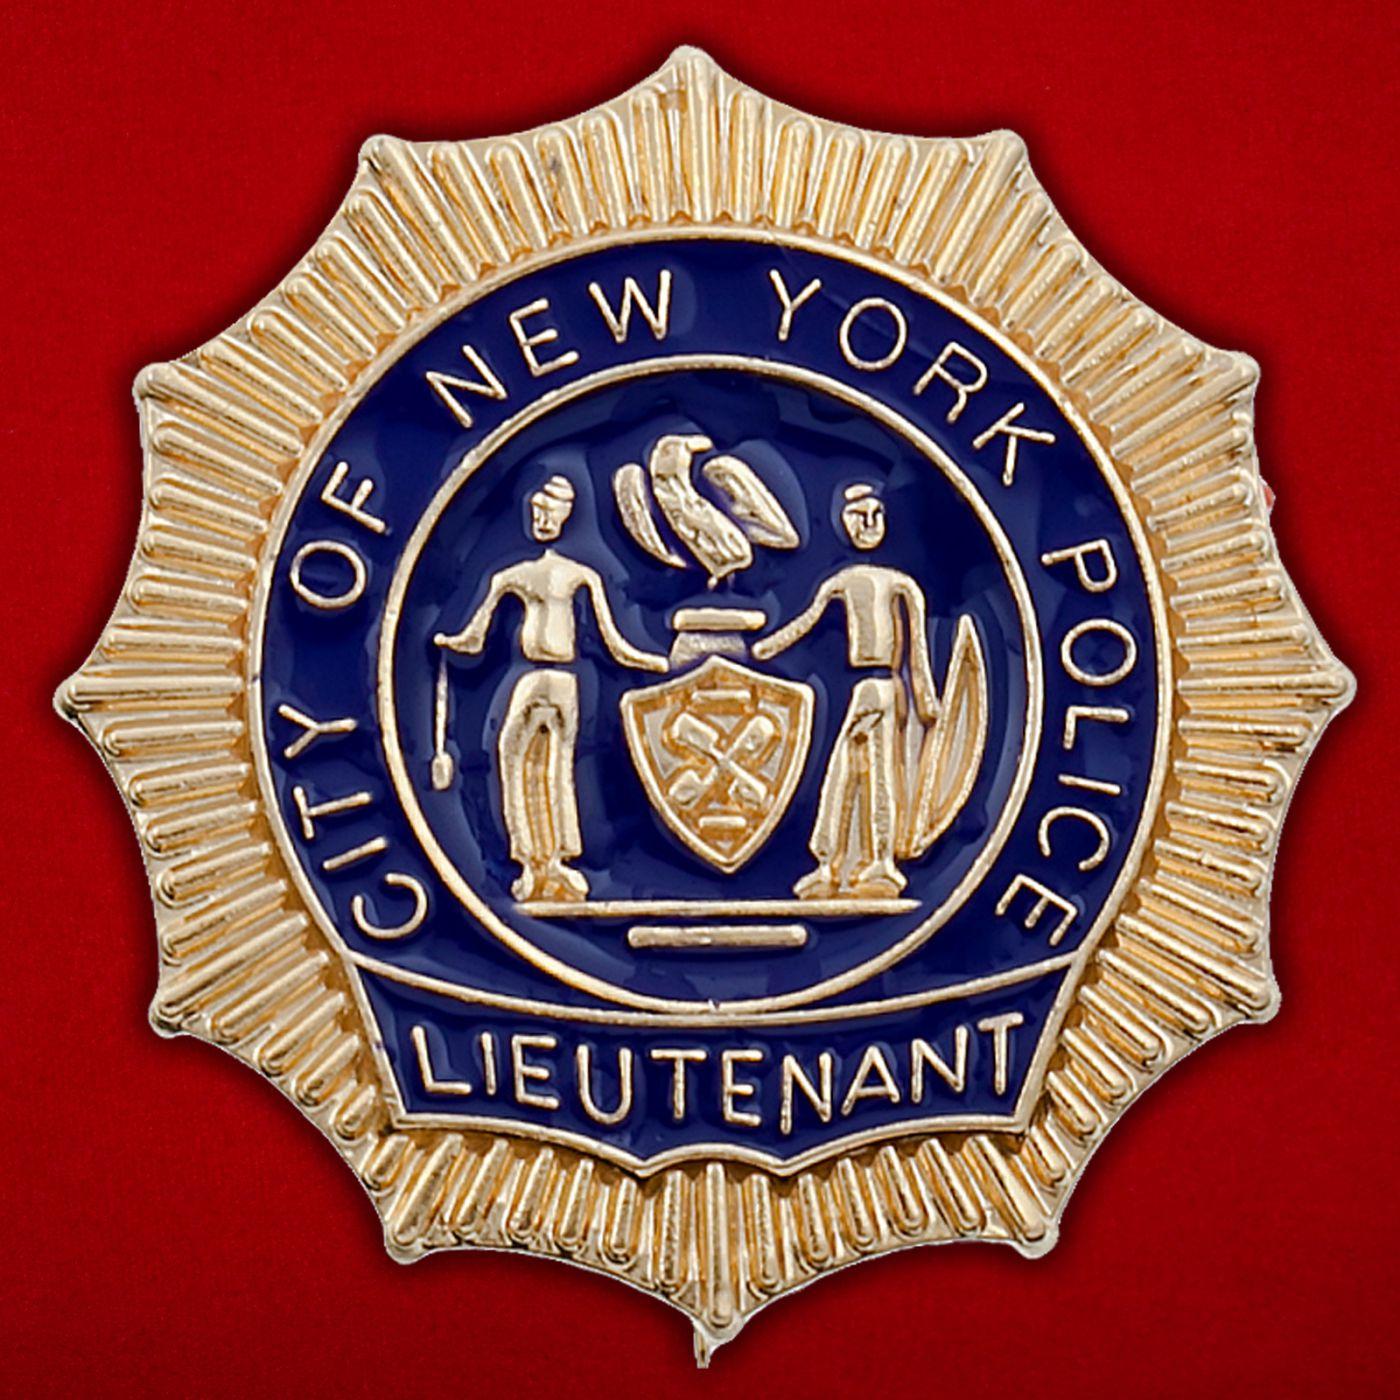 Значок лейтенанта полиции Нью-Йорка